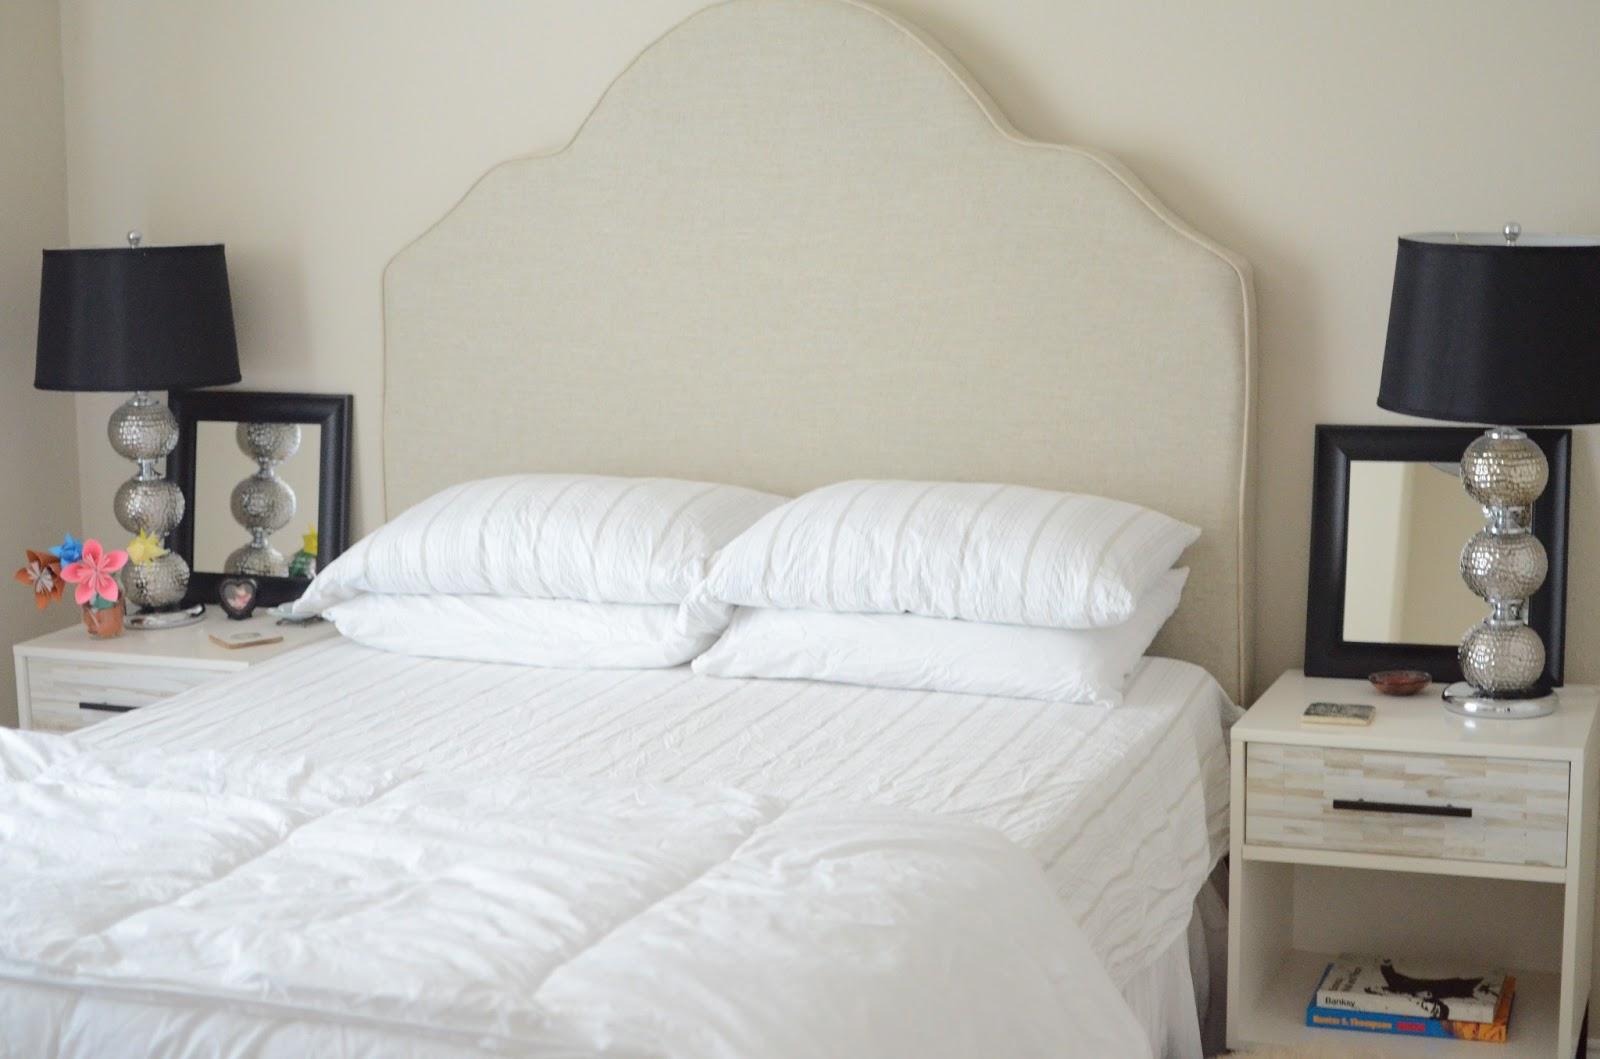 Stacy charlie bedroom redesign for Redesign bedroom